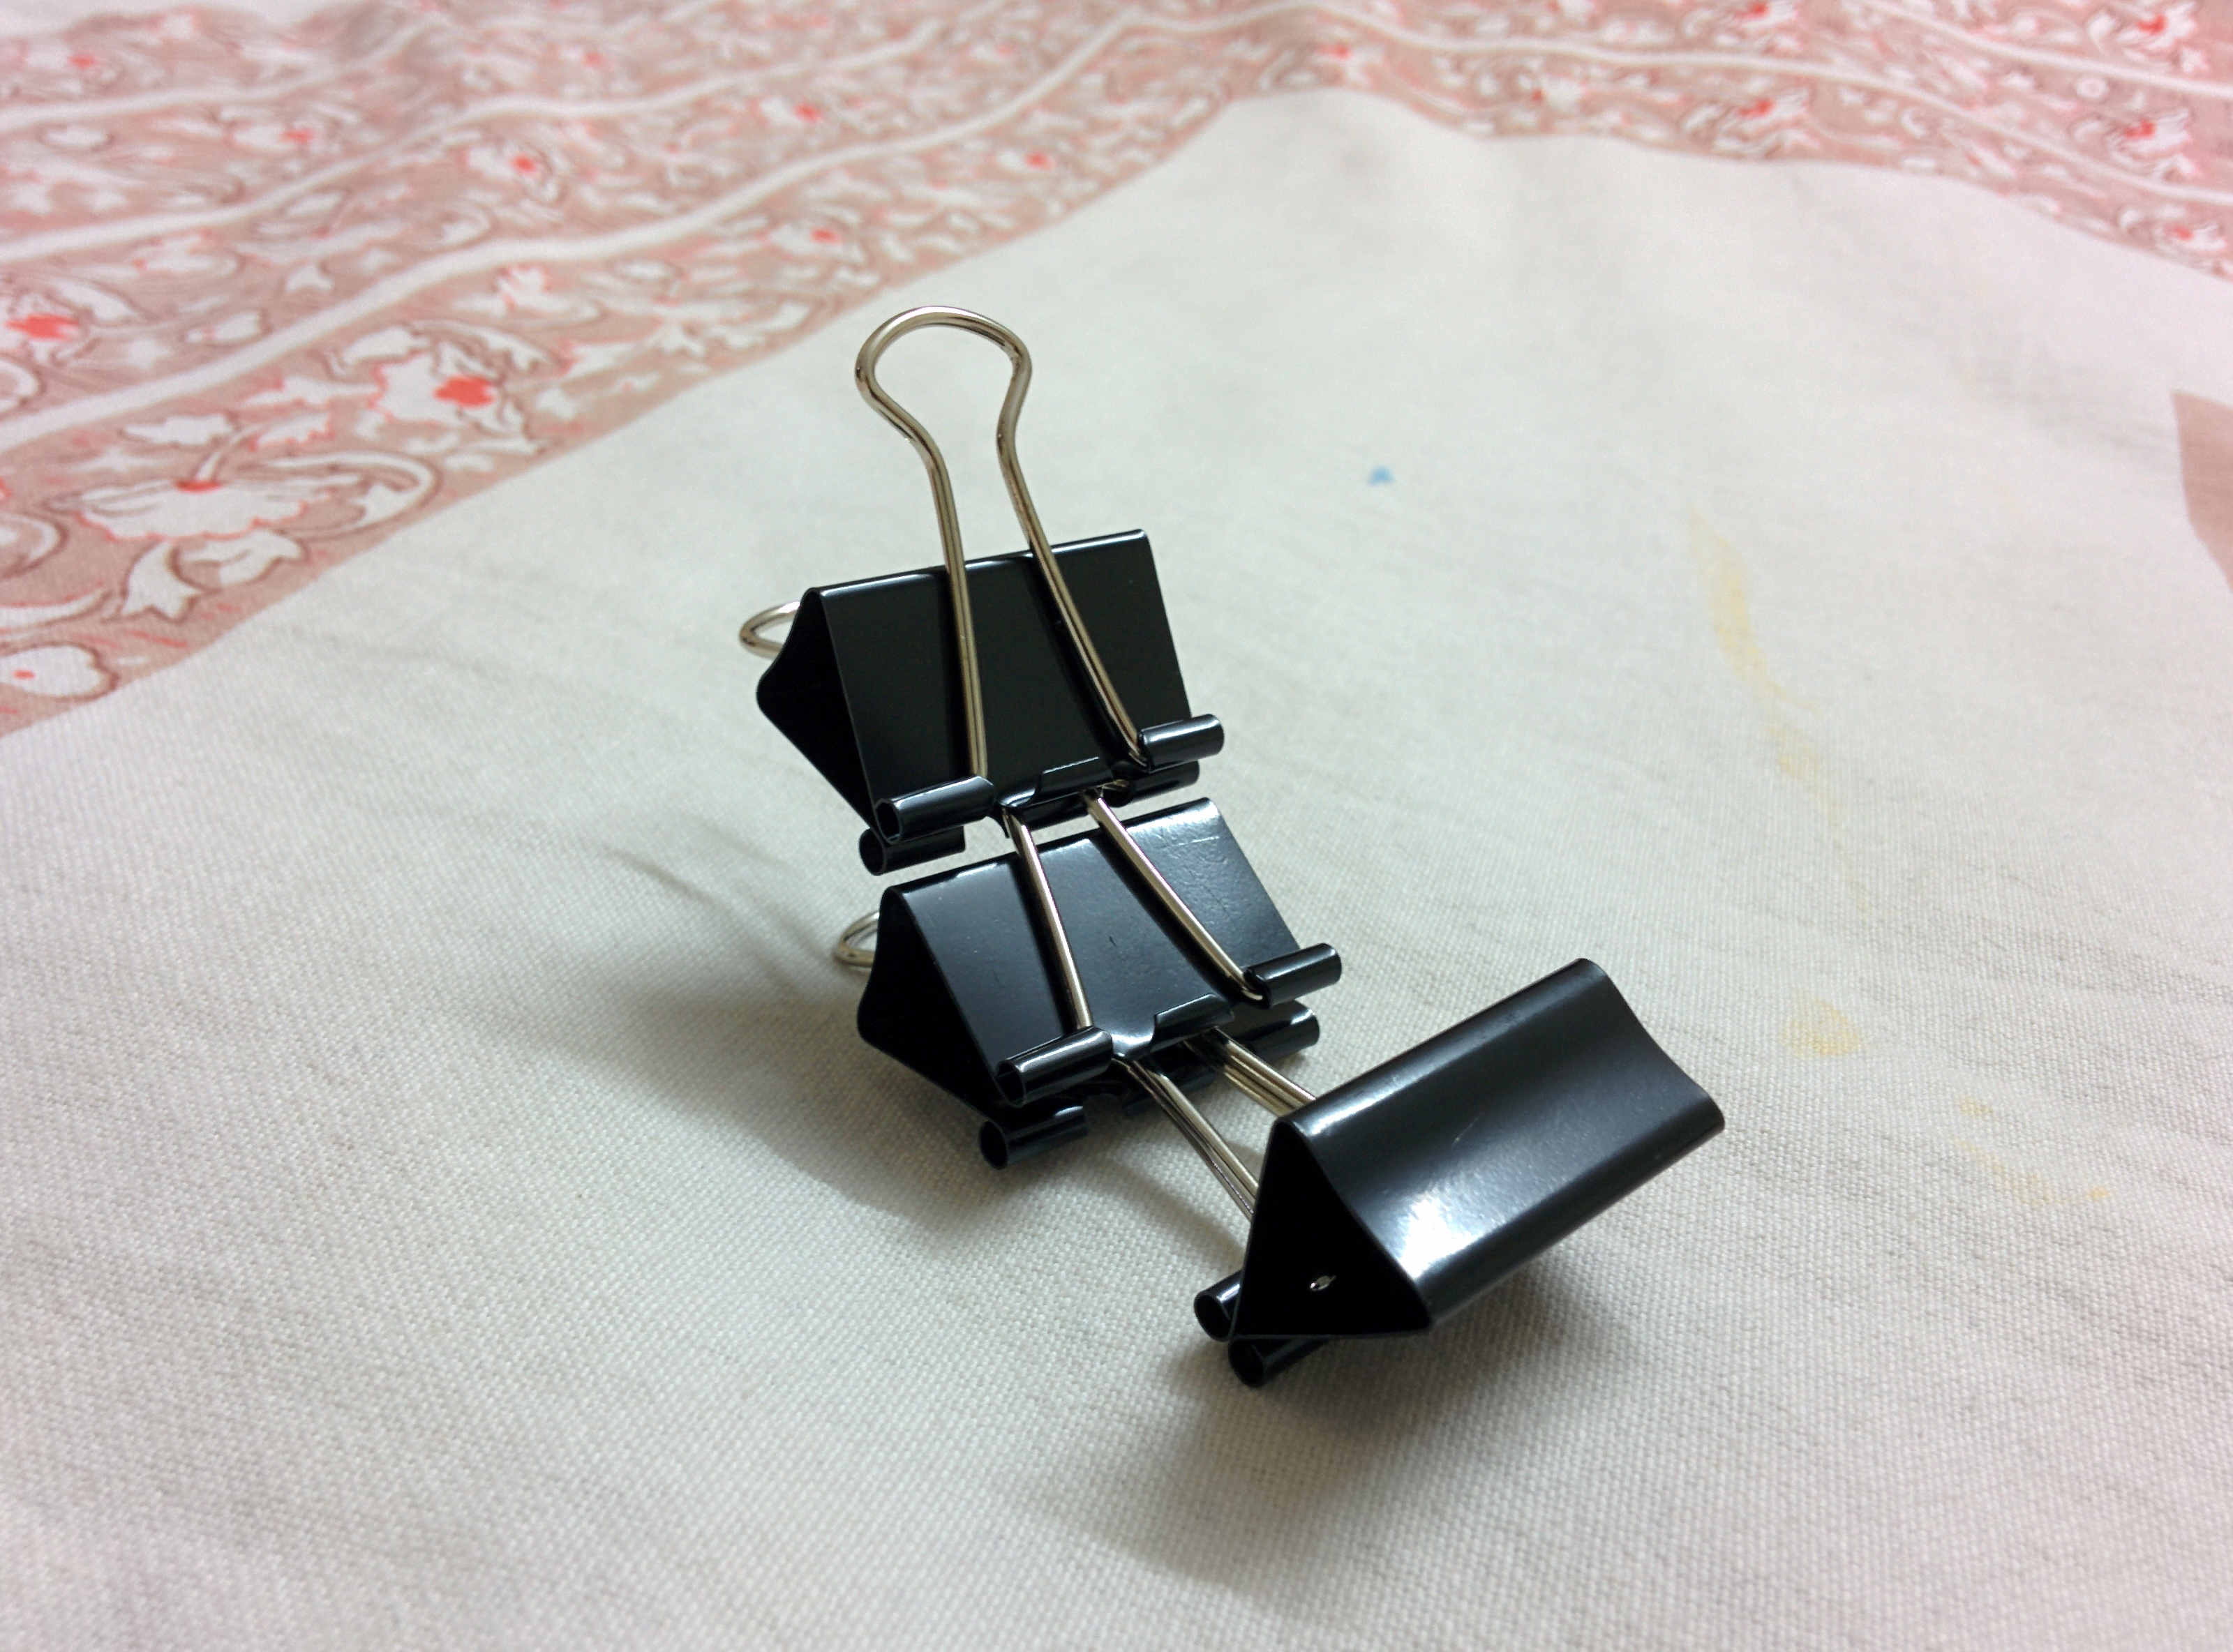 Binder Clip Phone Stand